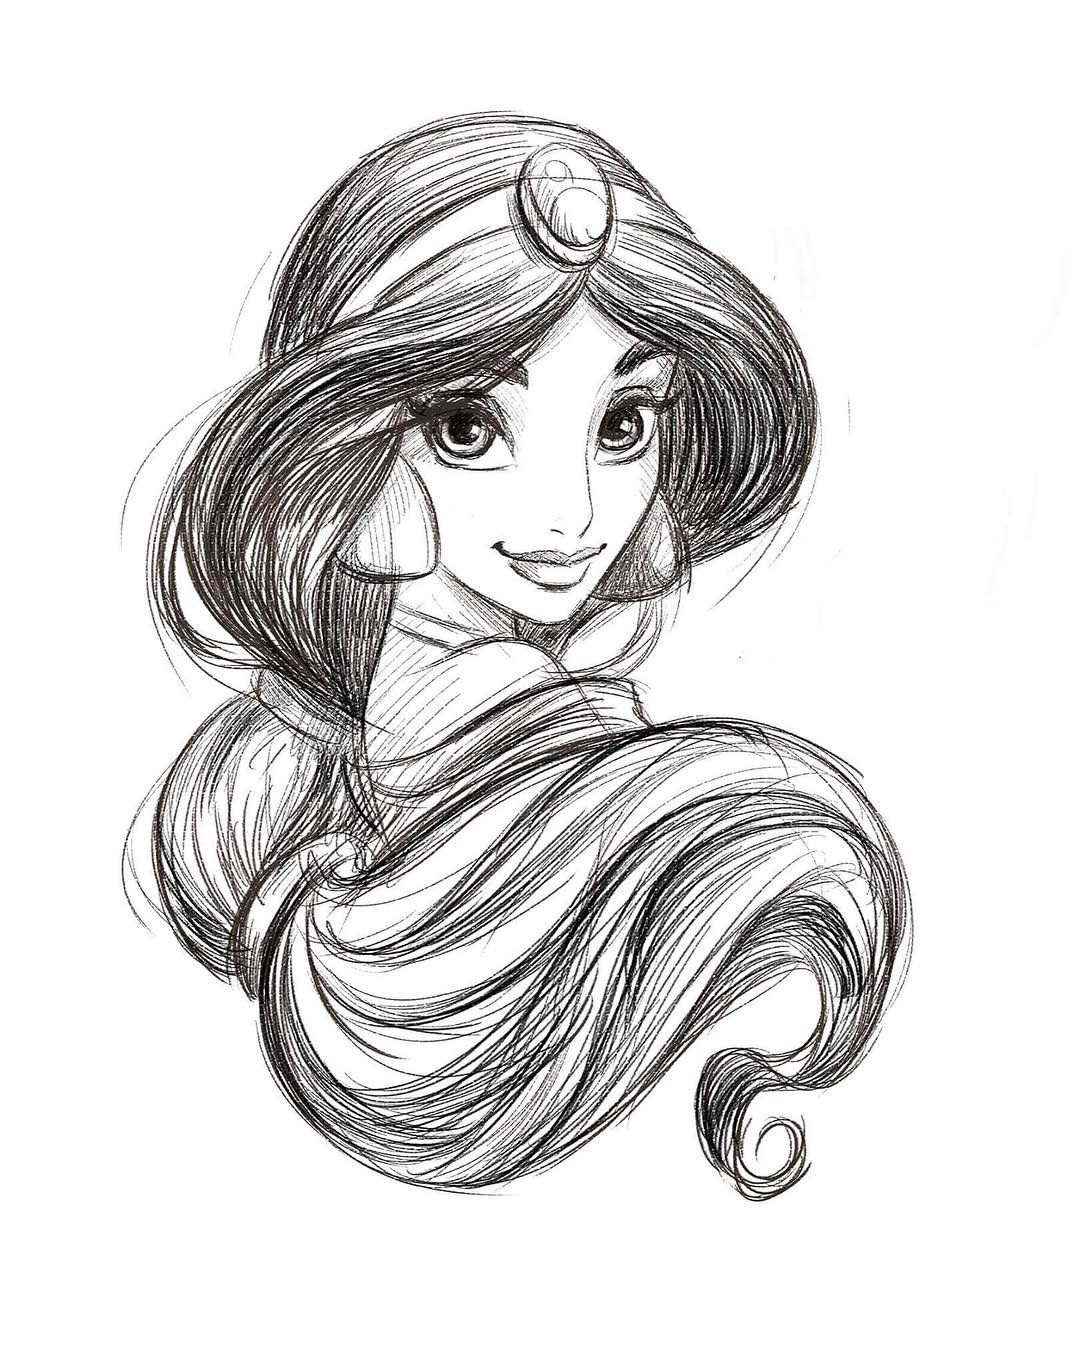 Jasmine Disney Disneyprincess Jasmine Princessjasmine Artwork Princess Disneysrts Disney Princess Drawings Disney Art Drawings Princess Drawings